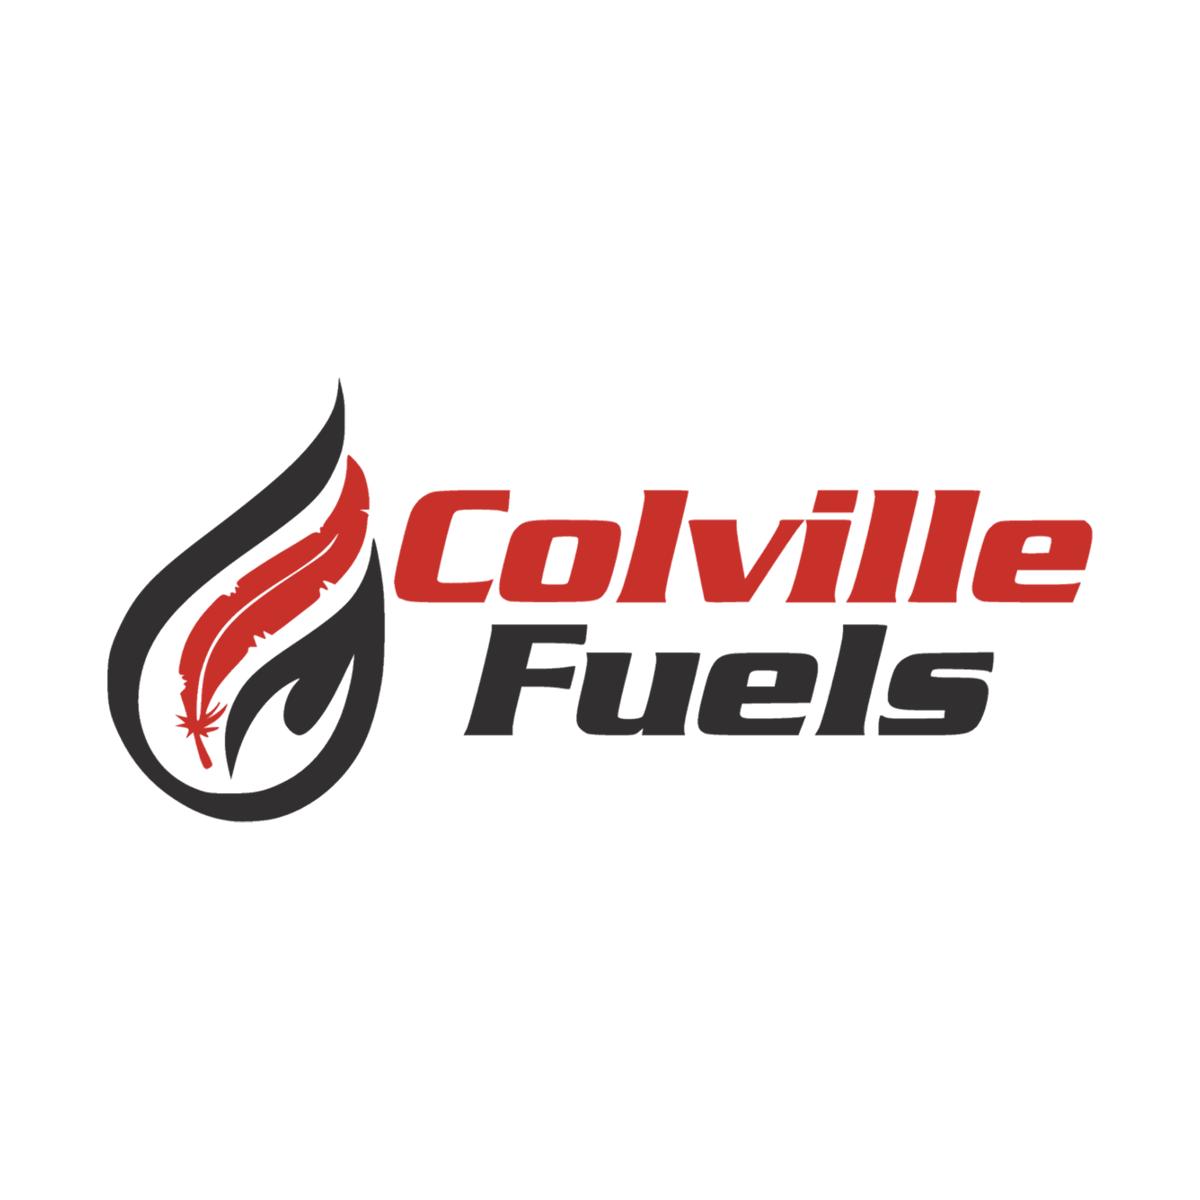 Colville Fuels logo